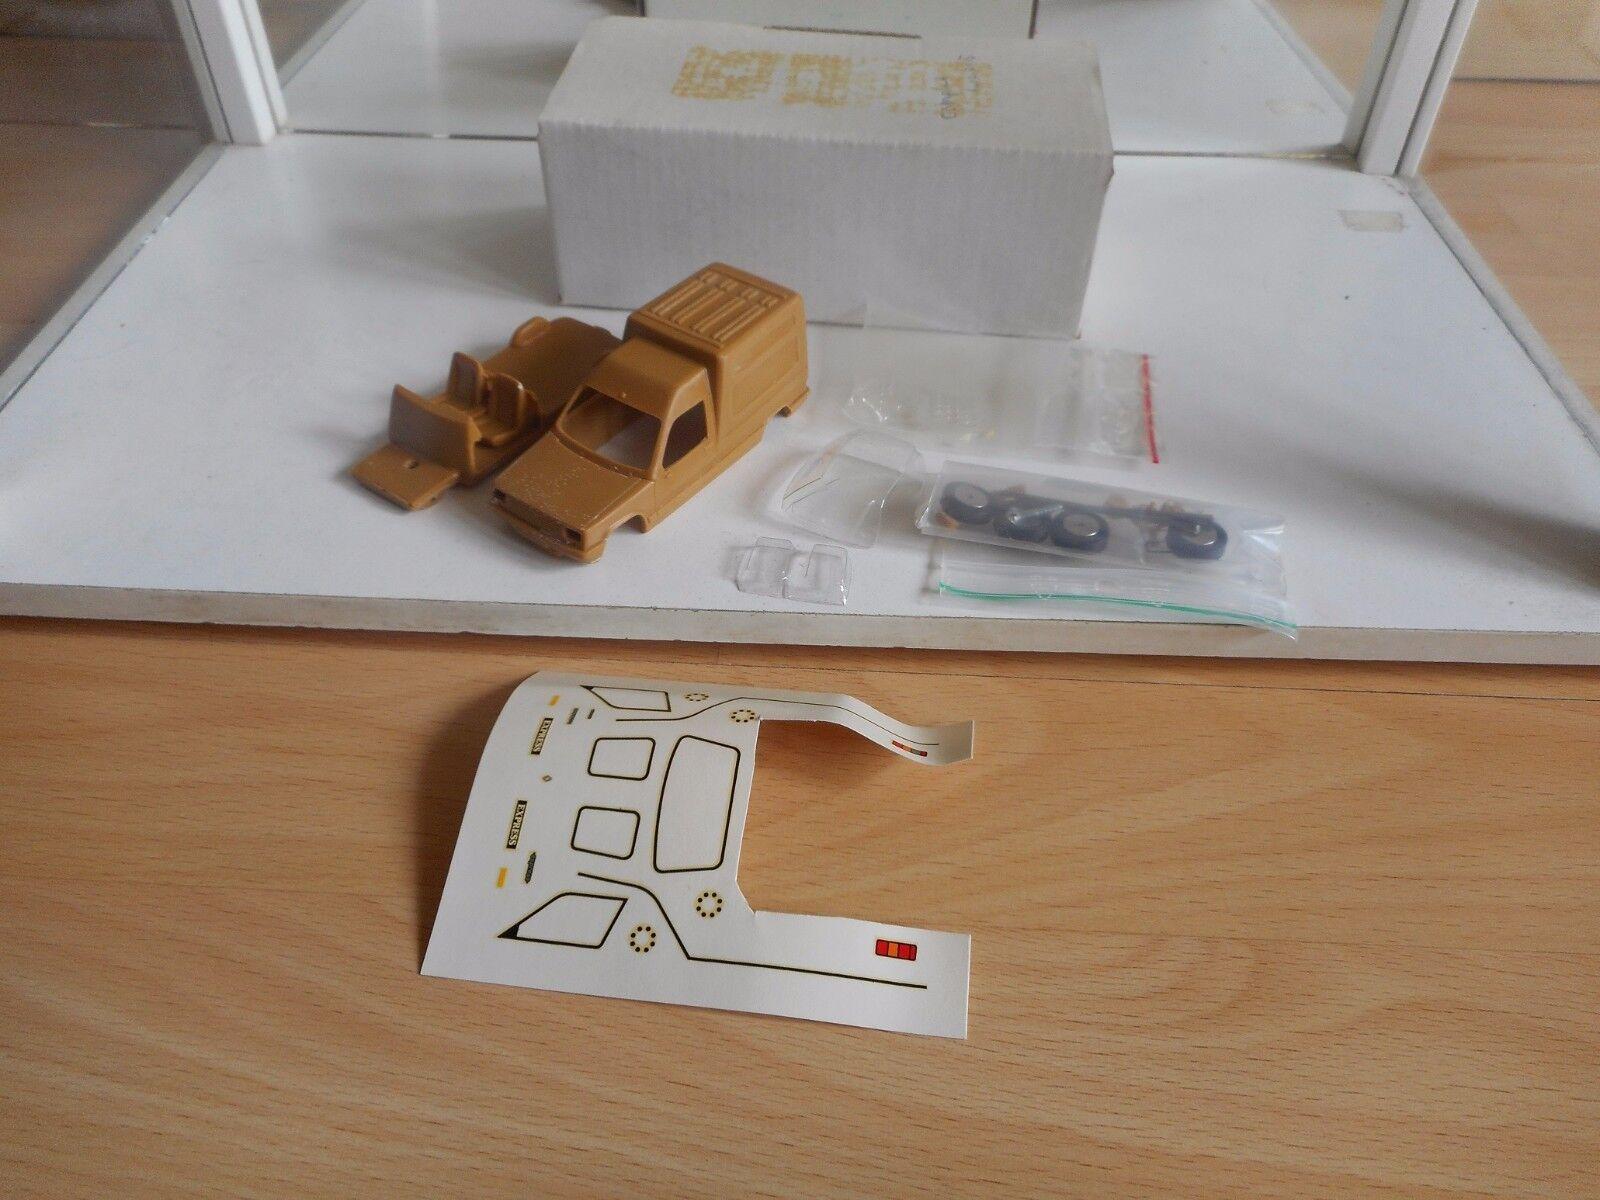 Model Resin Kit Alezan súper 5 Express Tole on 1 43 in Box